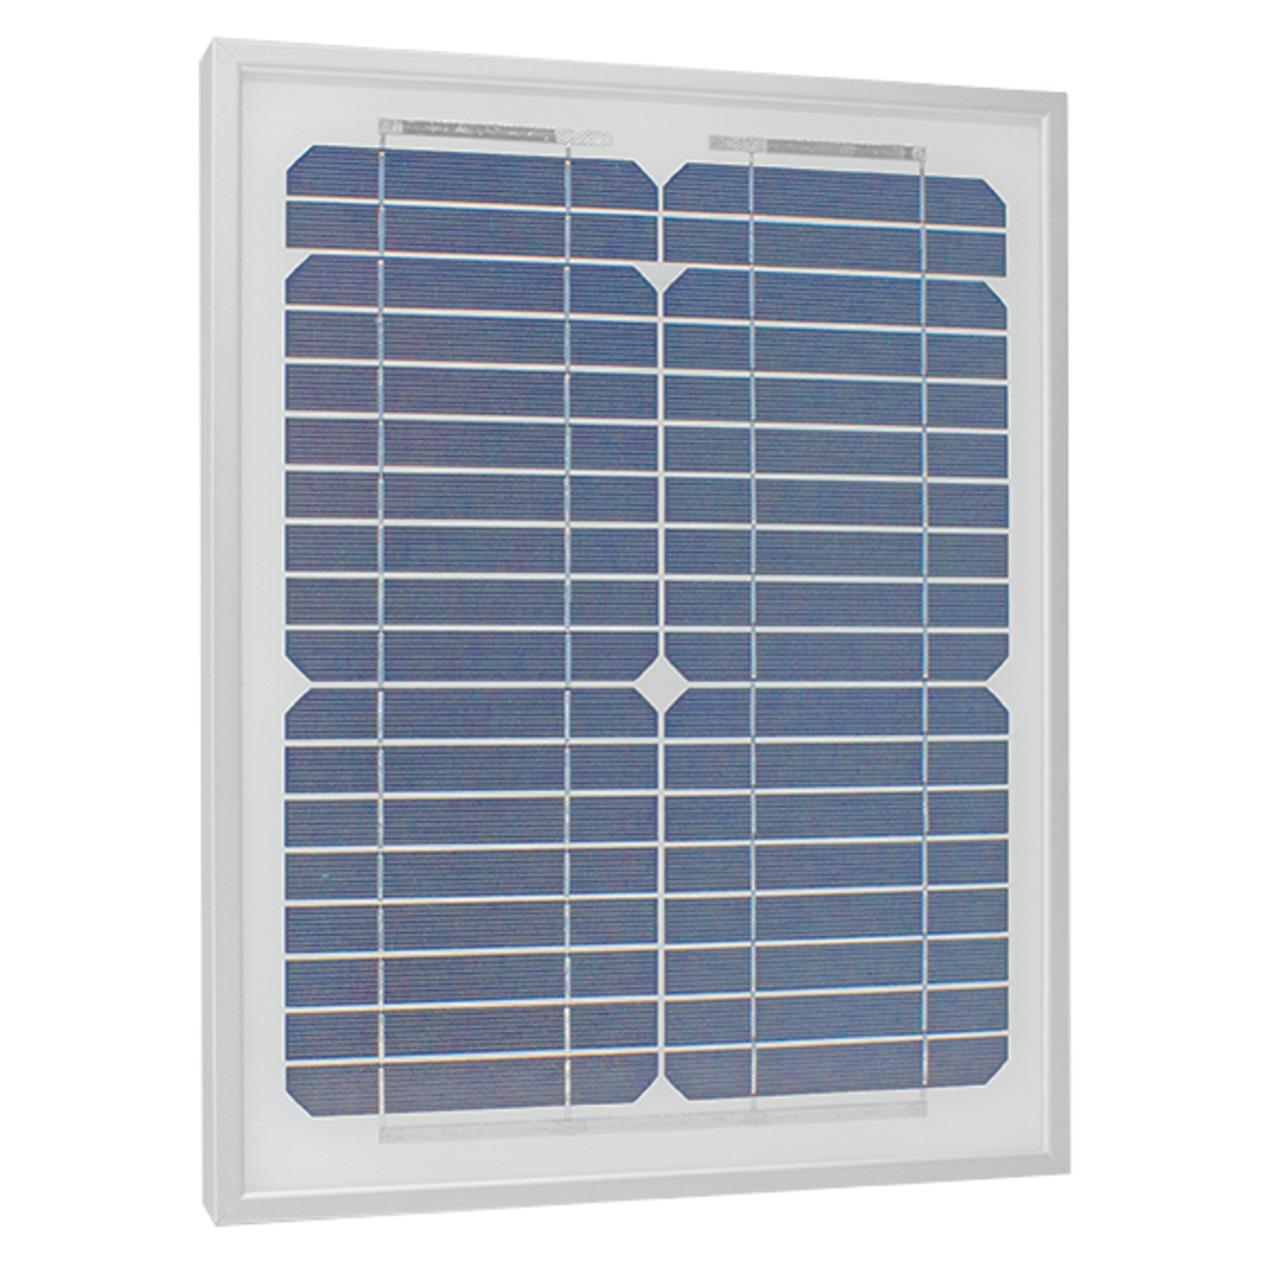 Phaesun Monokristalline Solarmodul Sun Plus 10 S- 12 V- 10 W